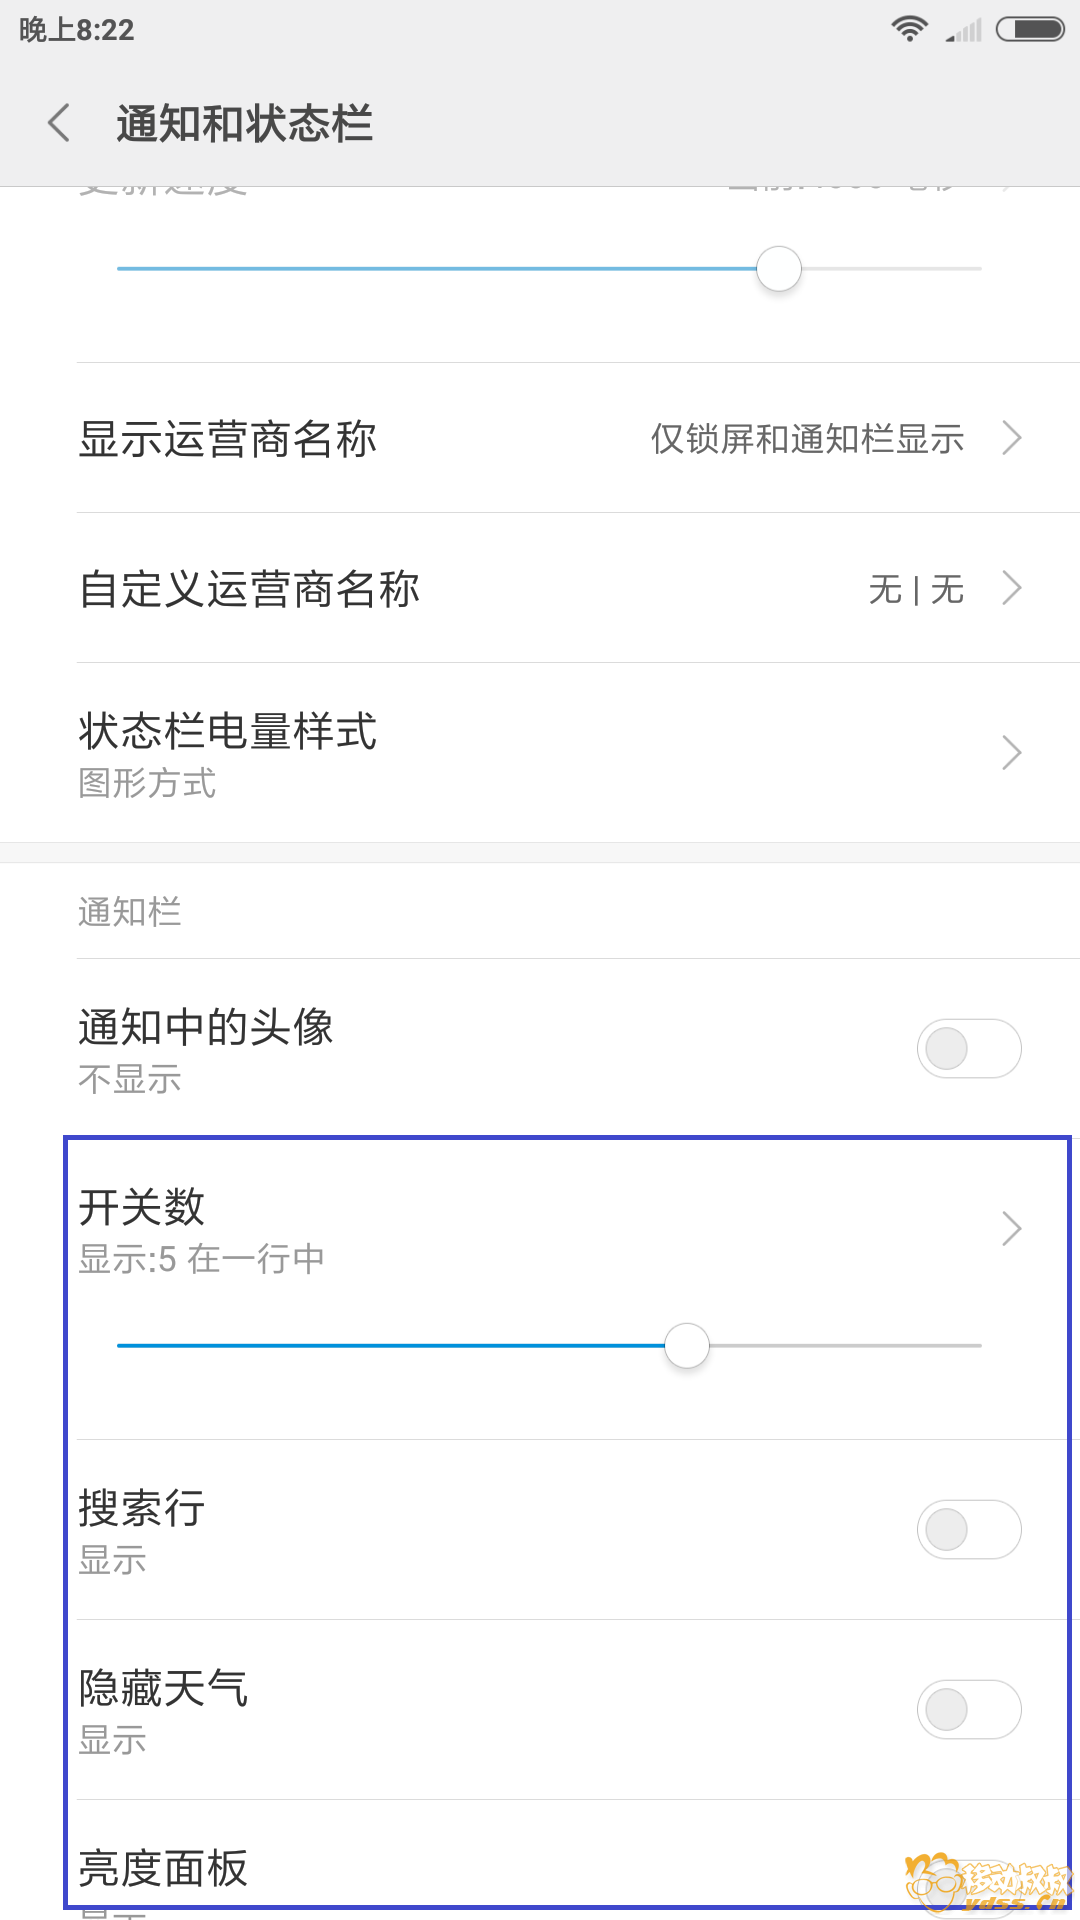 Screenshot_2018-02-28-20-22-19-631_com.android.settings.png